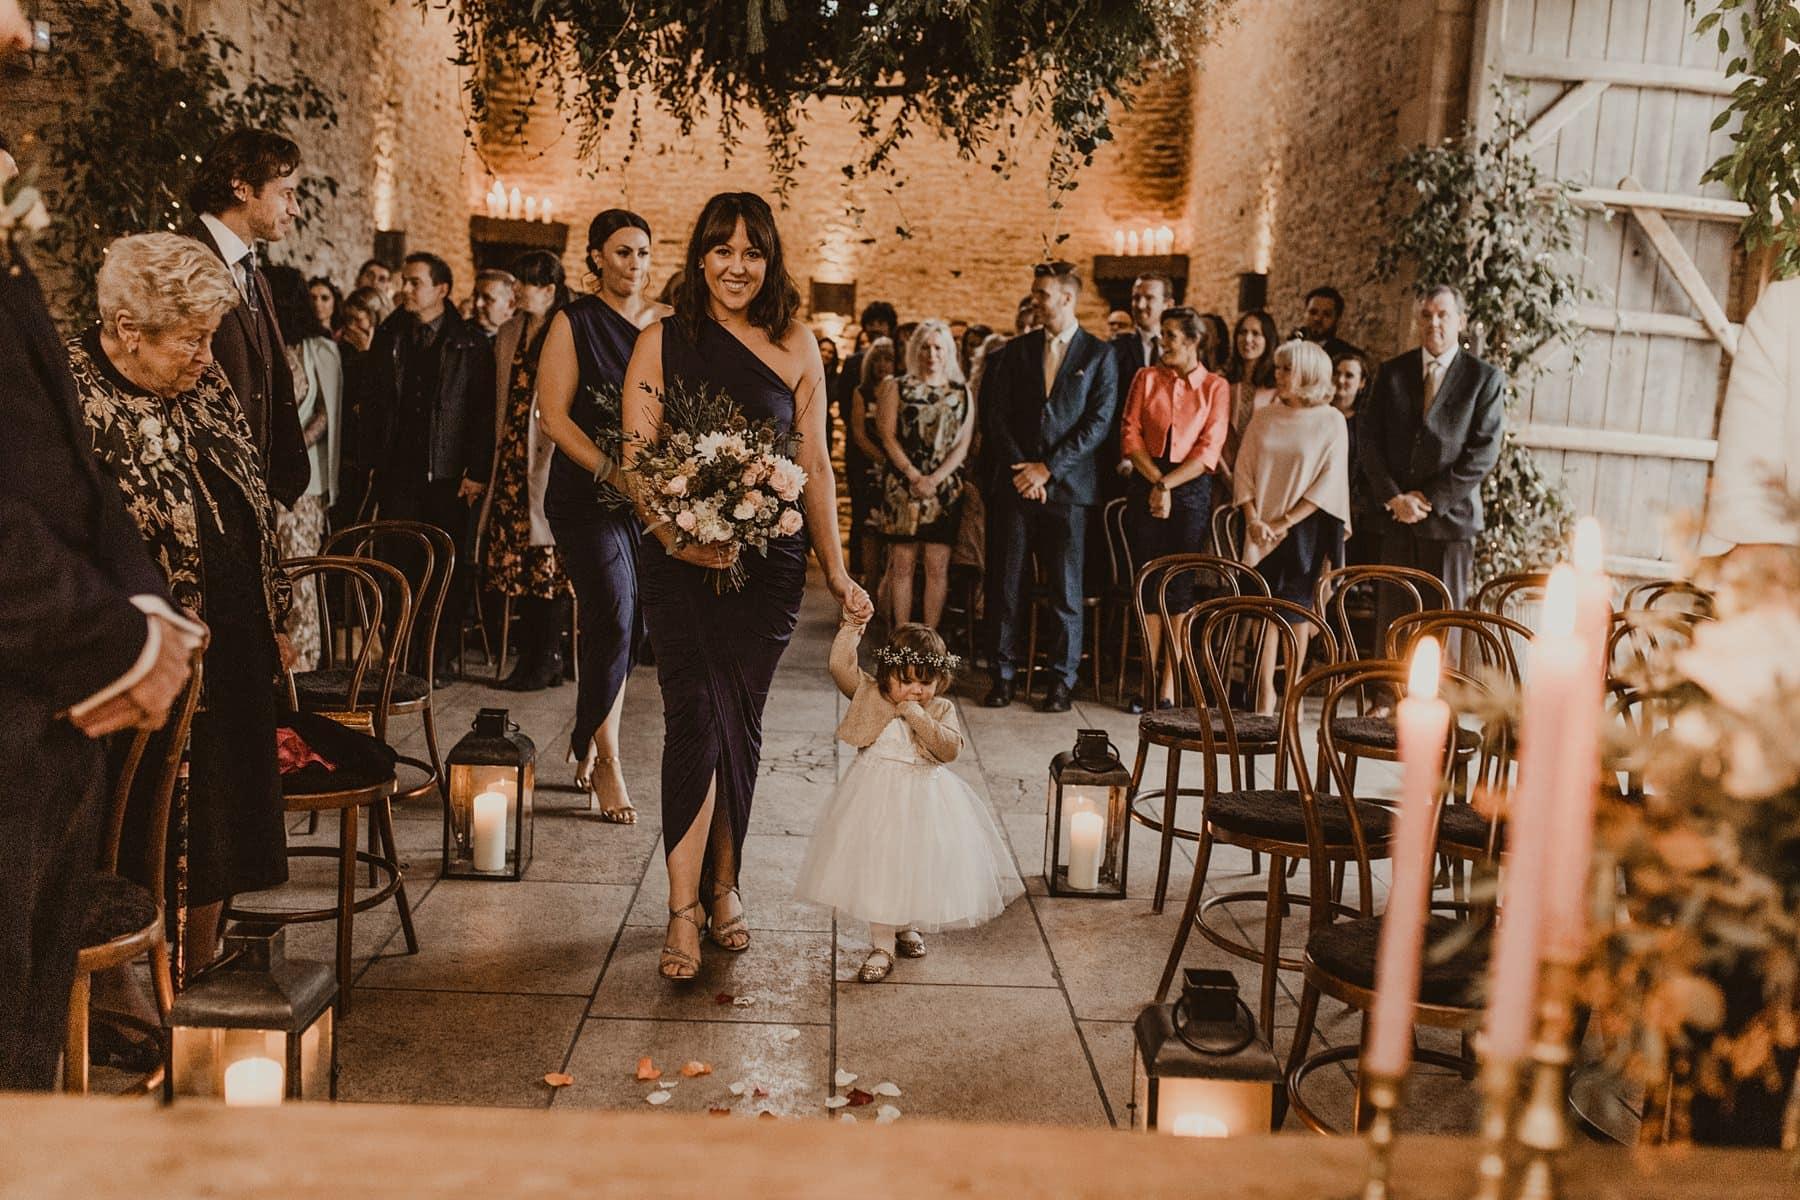 Bridesmaid and flower girl walking down isle